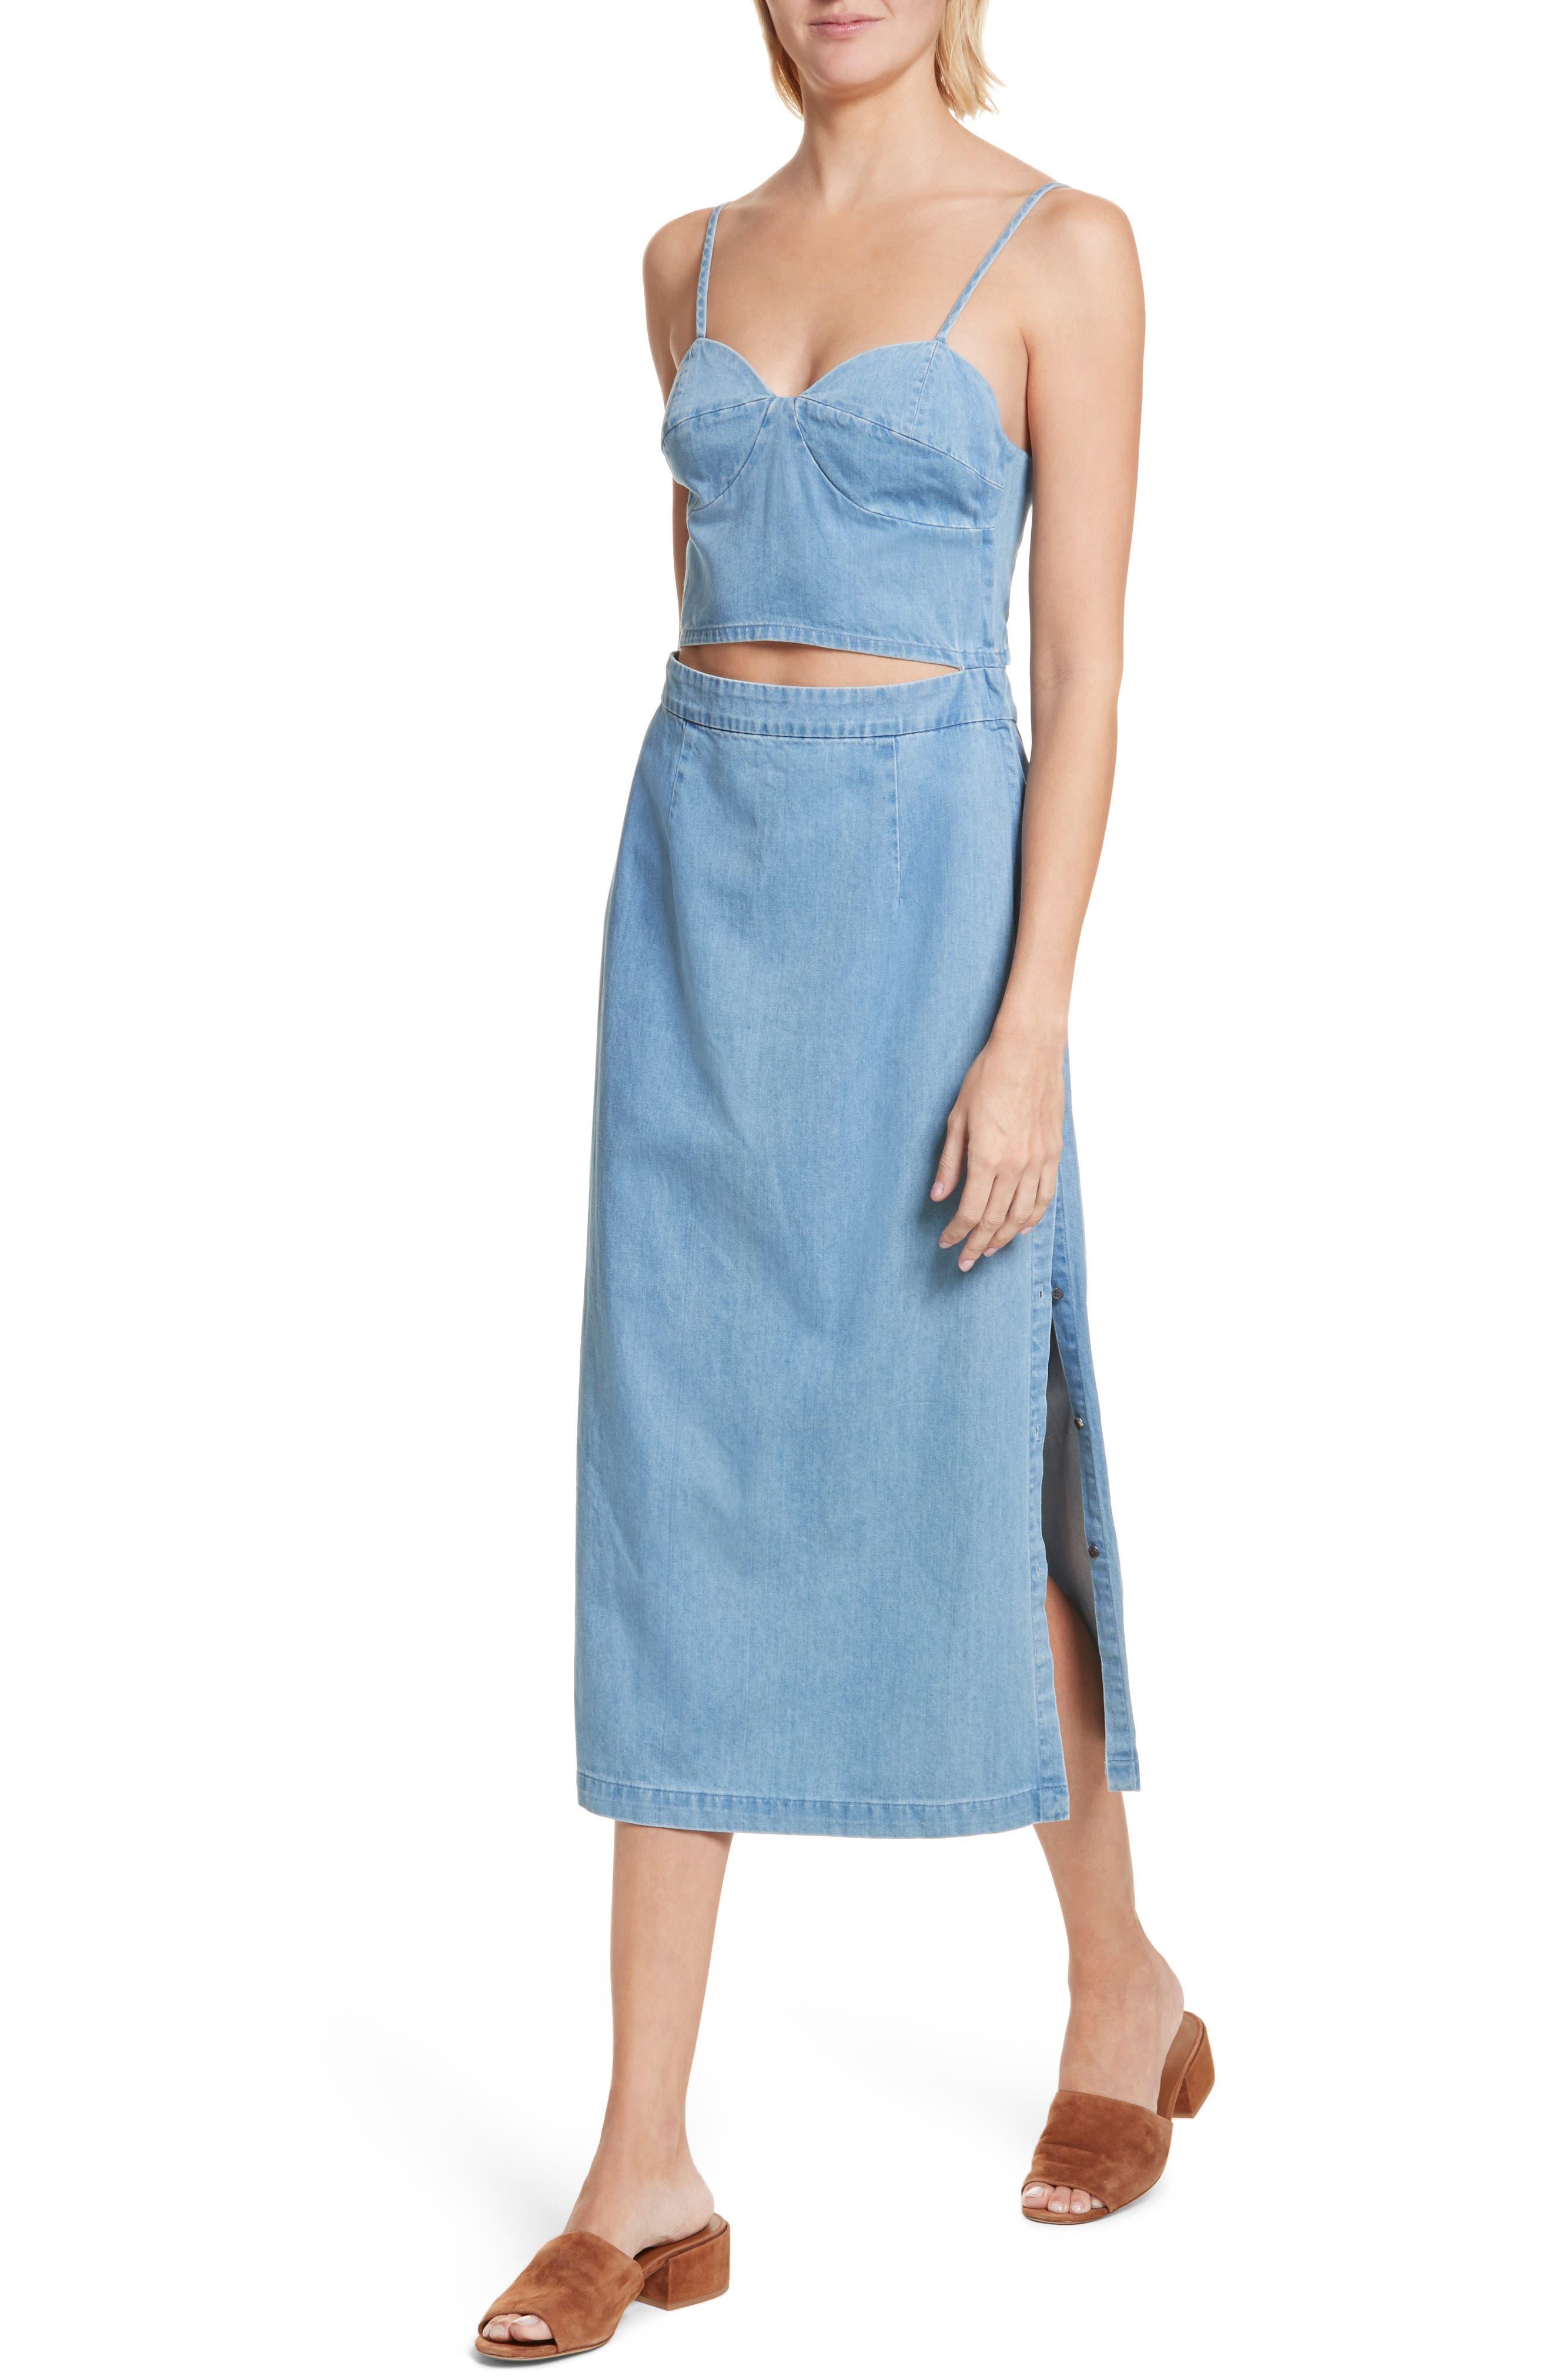 Peekaboo Chambray Midi Dress,                             Alternate thumbnail 4, color,                             421